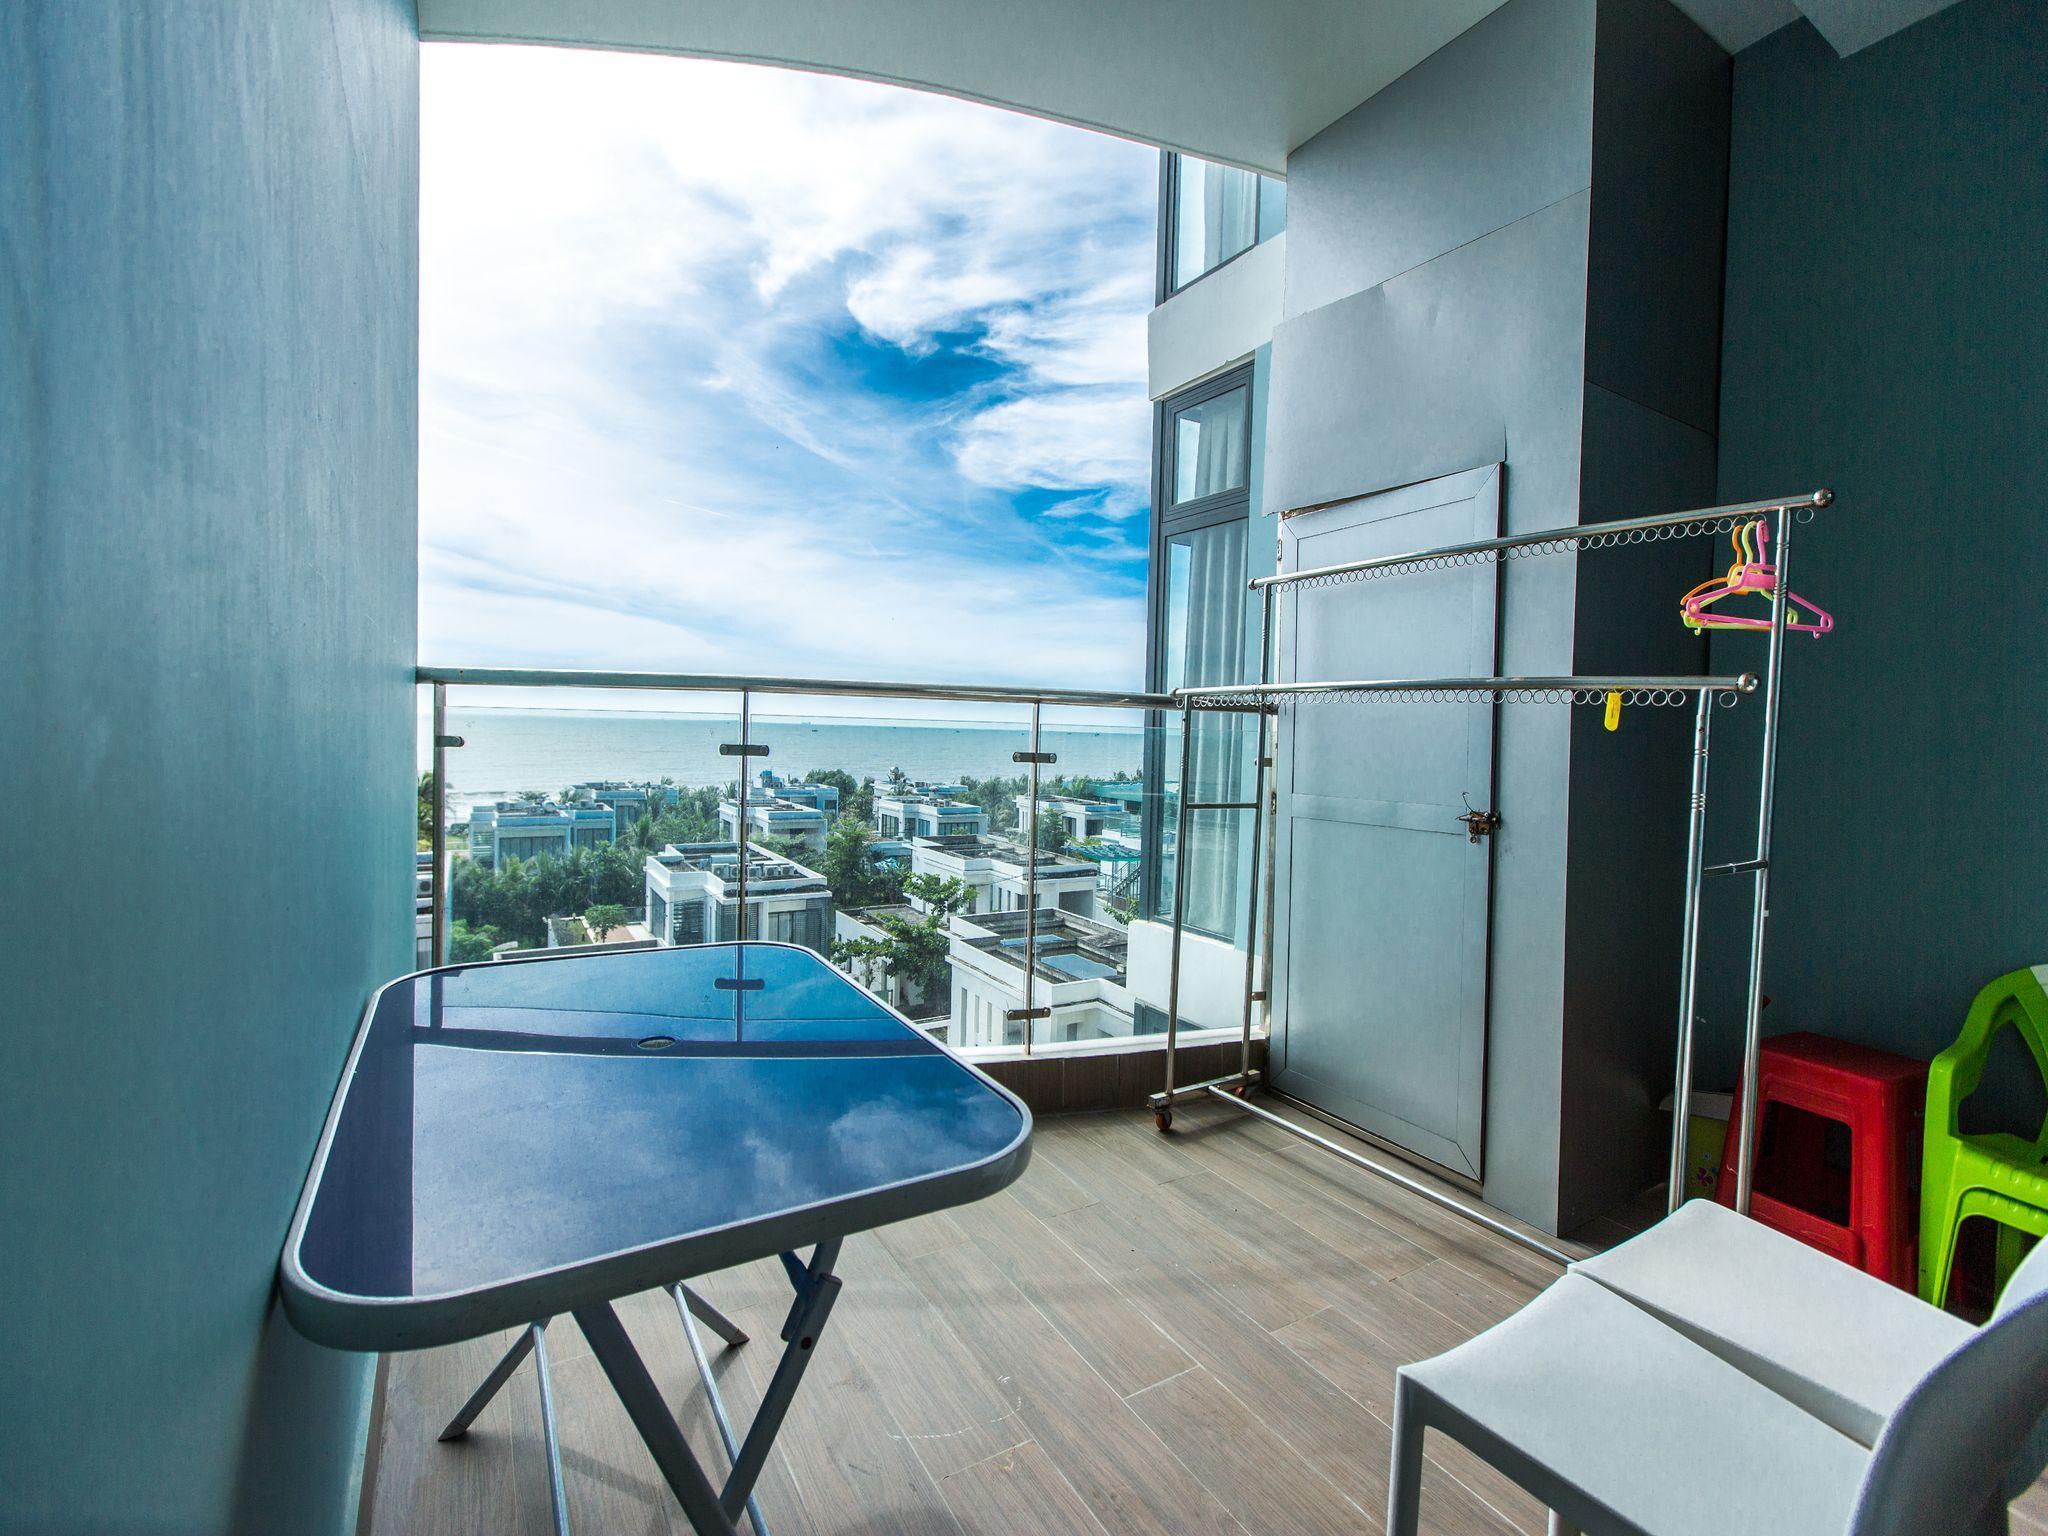 HL Luxury Blue Sapphire Seaview Apartment A502